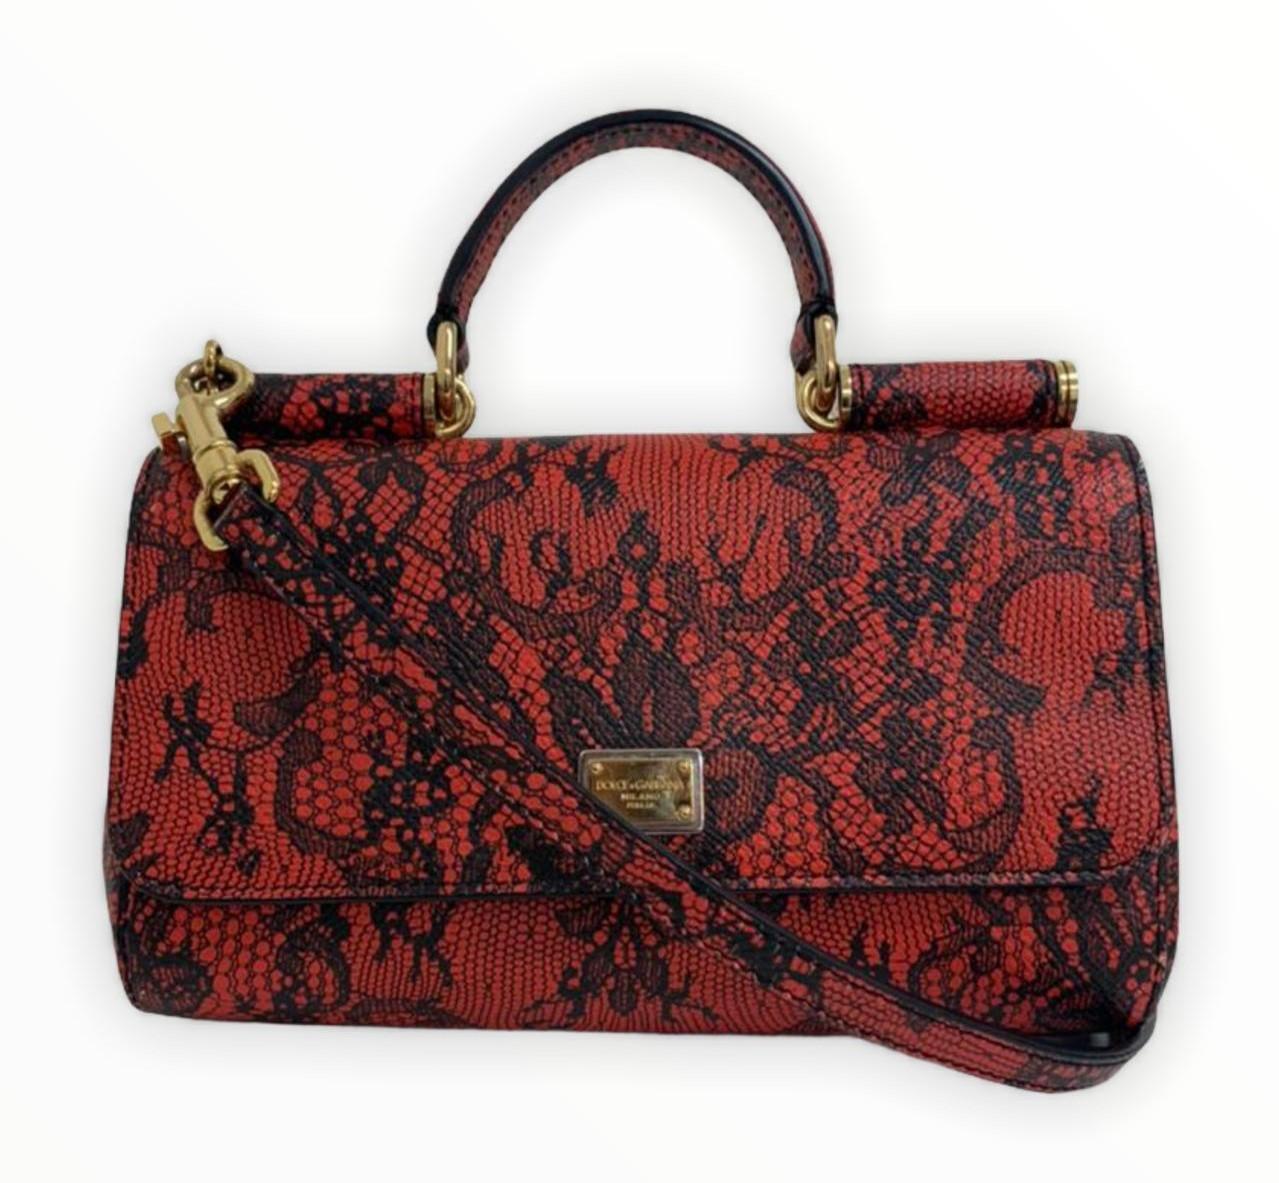 Bolsa Dolce & Gabbana Crossbody com Renda